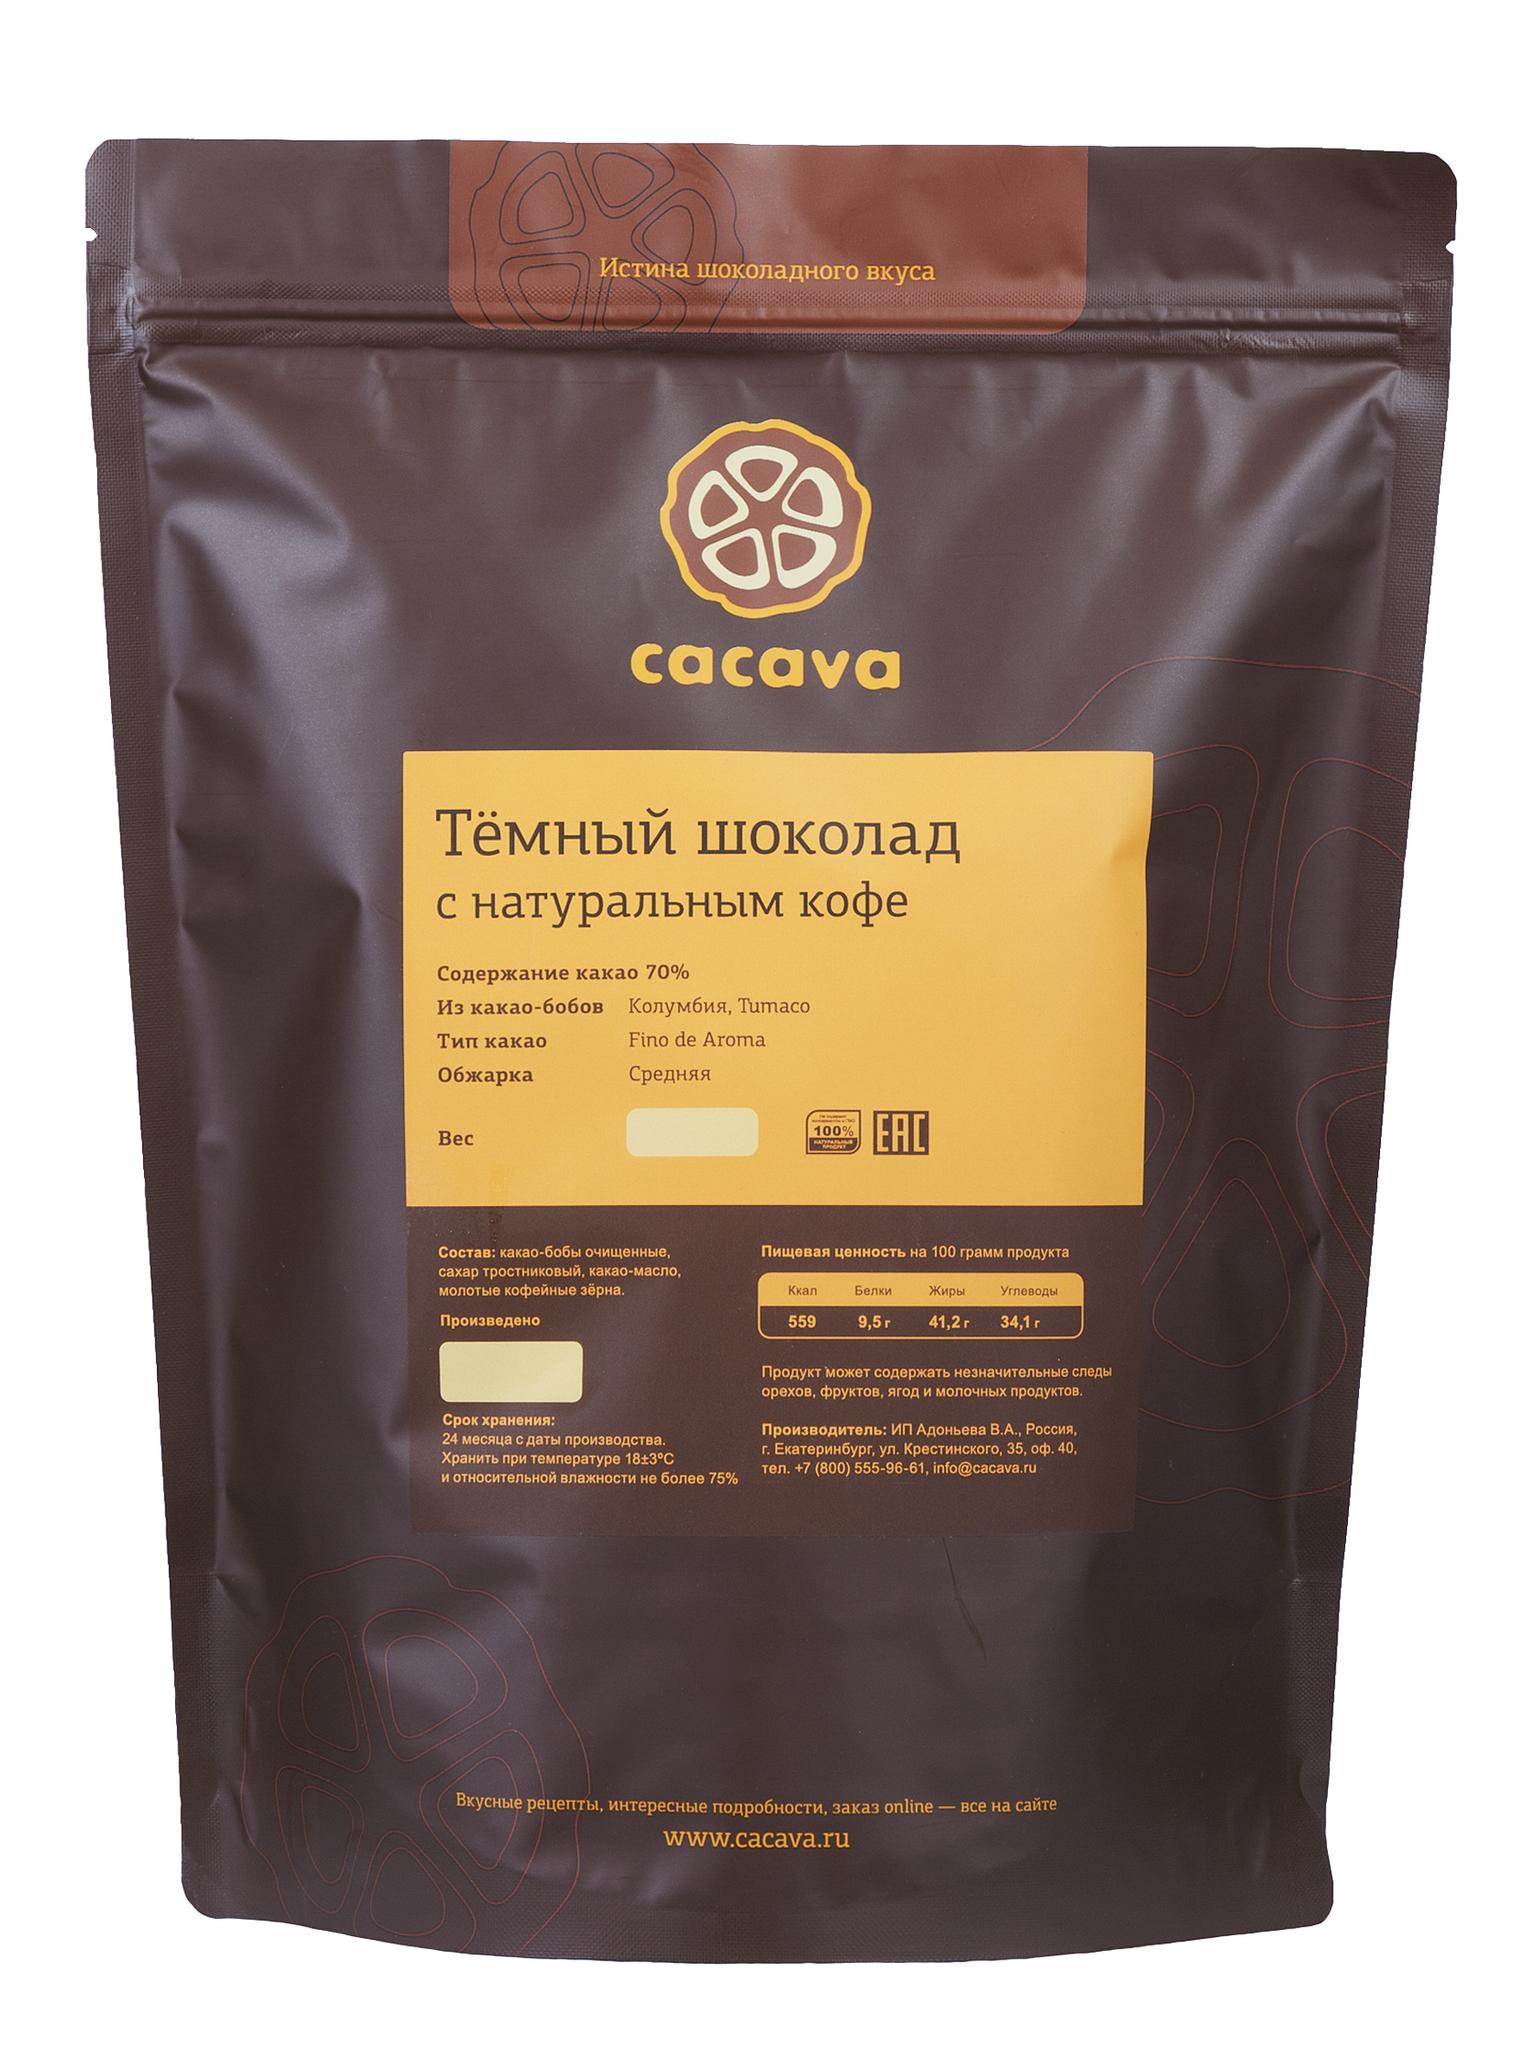 Тёмный шоколад с кофе 70 % какао (Колумбия, Tumaco), упаковка 1 кг